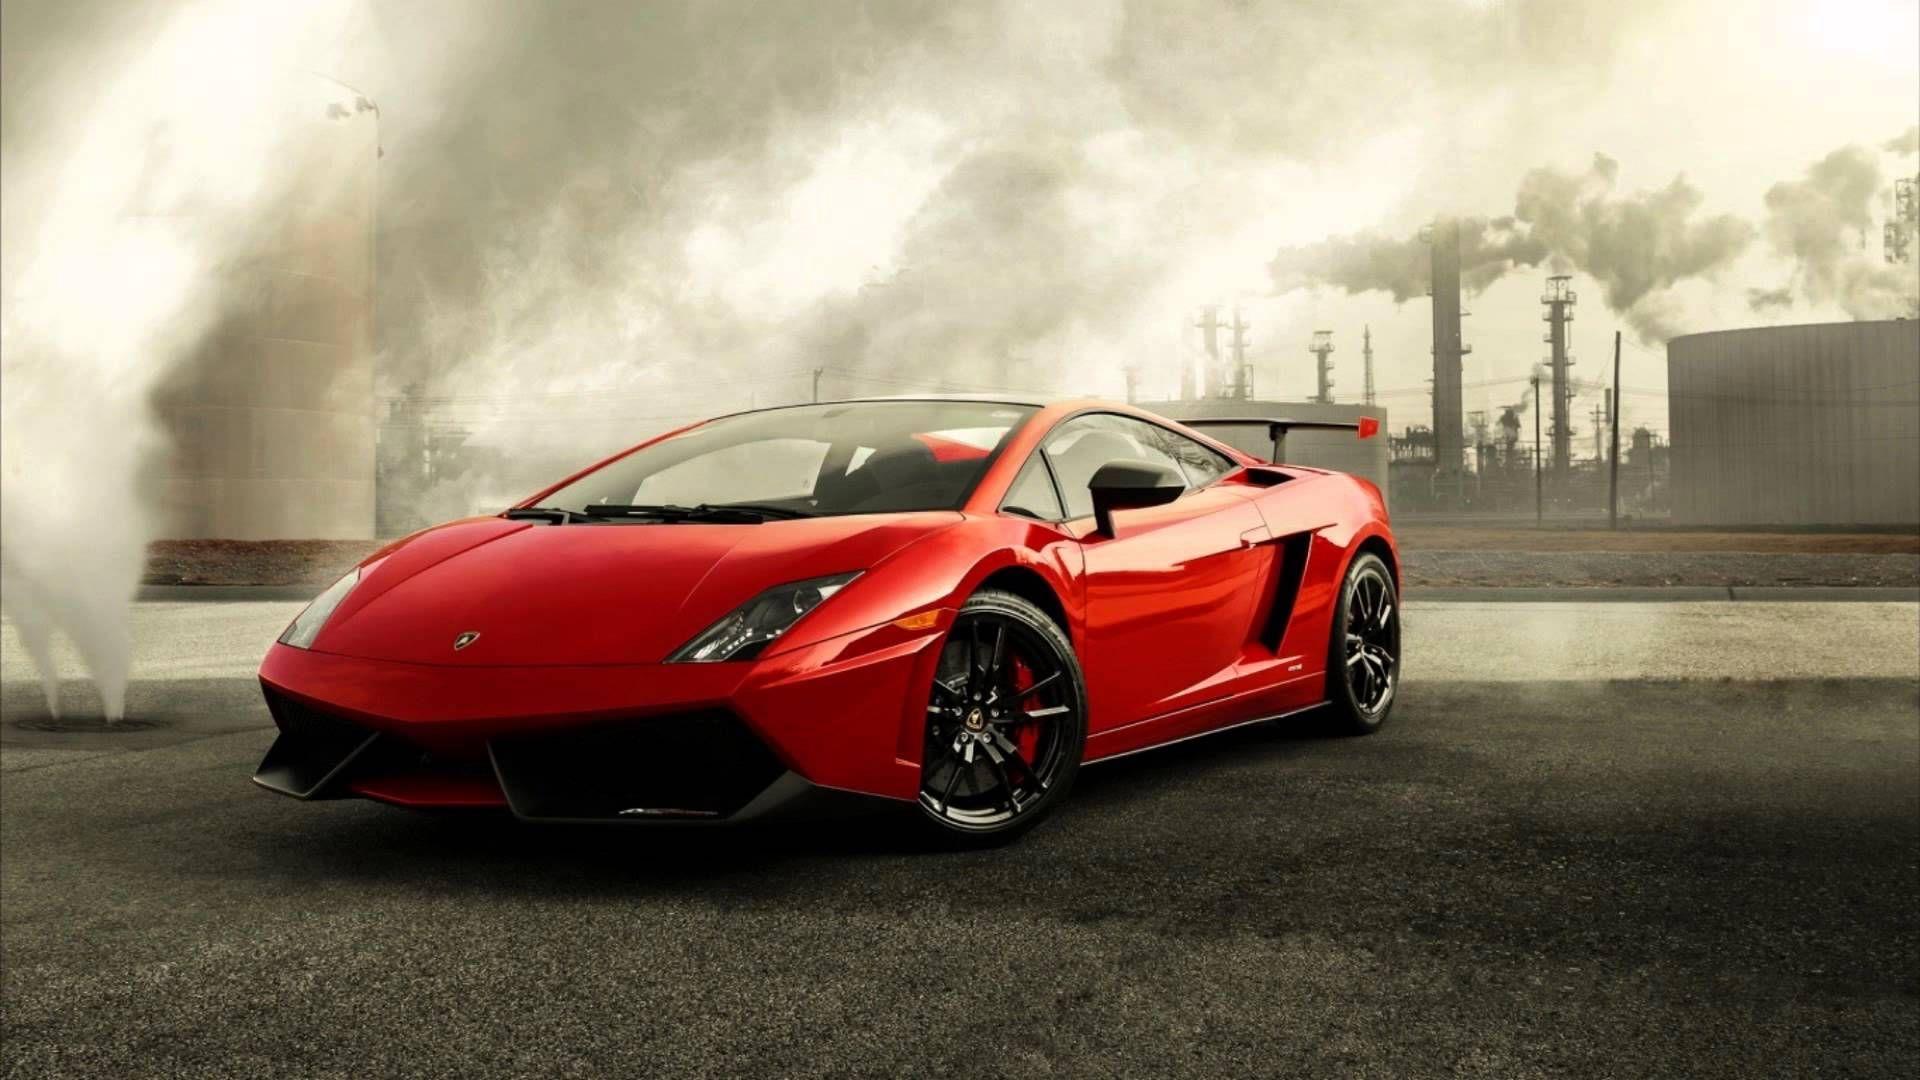 Fire Flaming Hot Trap Instrumental Rap Beat Prod By Cyrov Lamborghini Gallardo Sports Car Photos Car Wallpapers